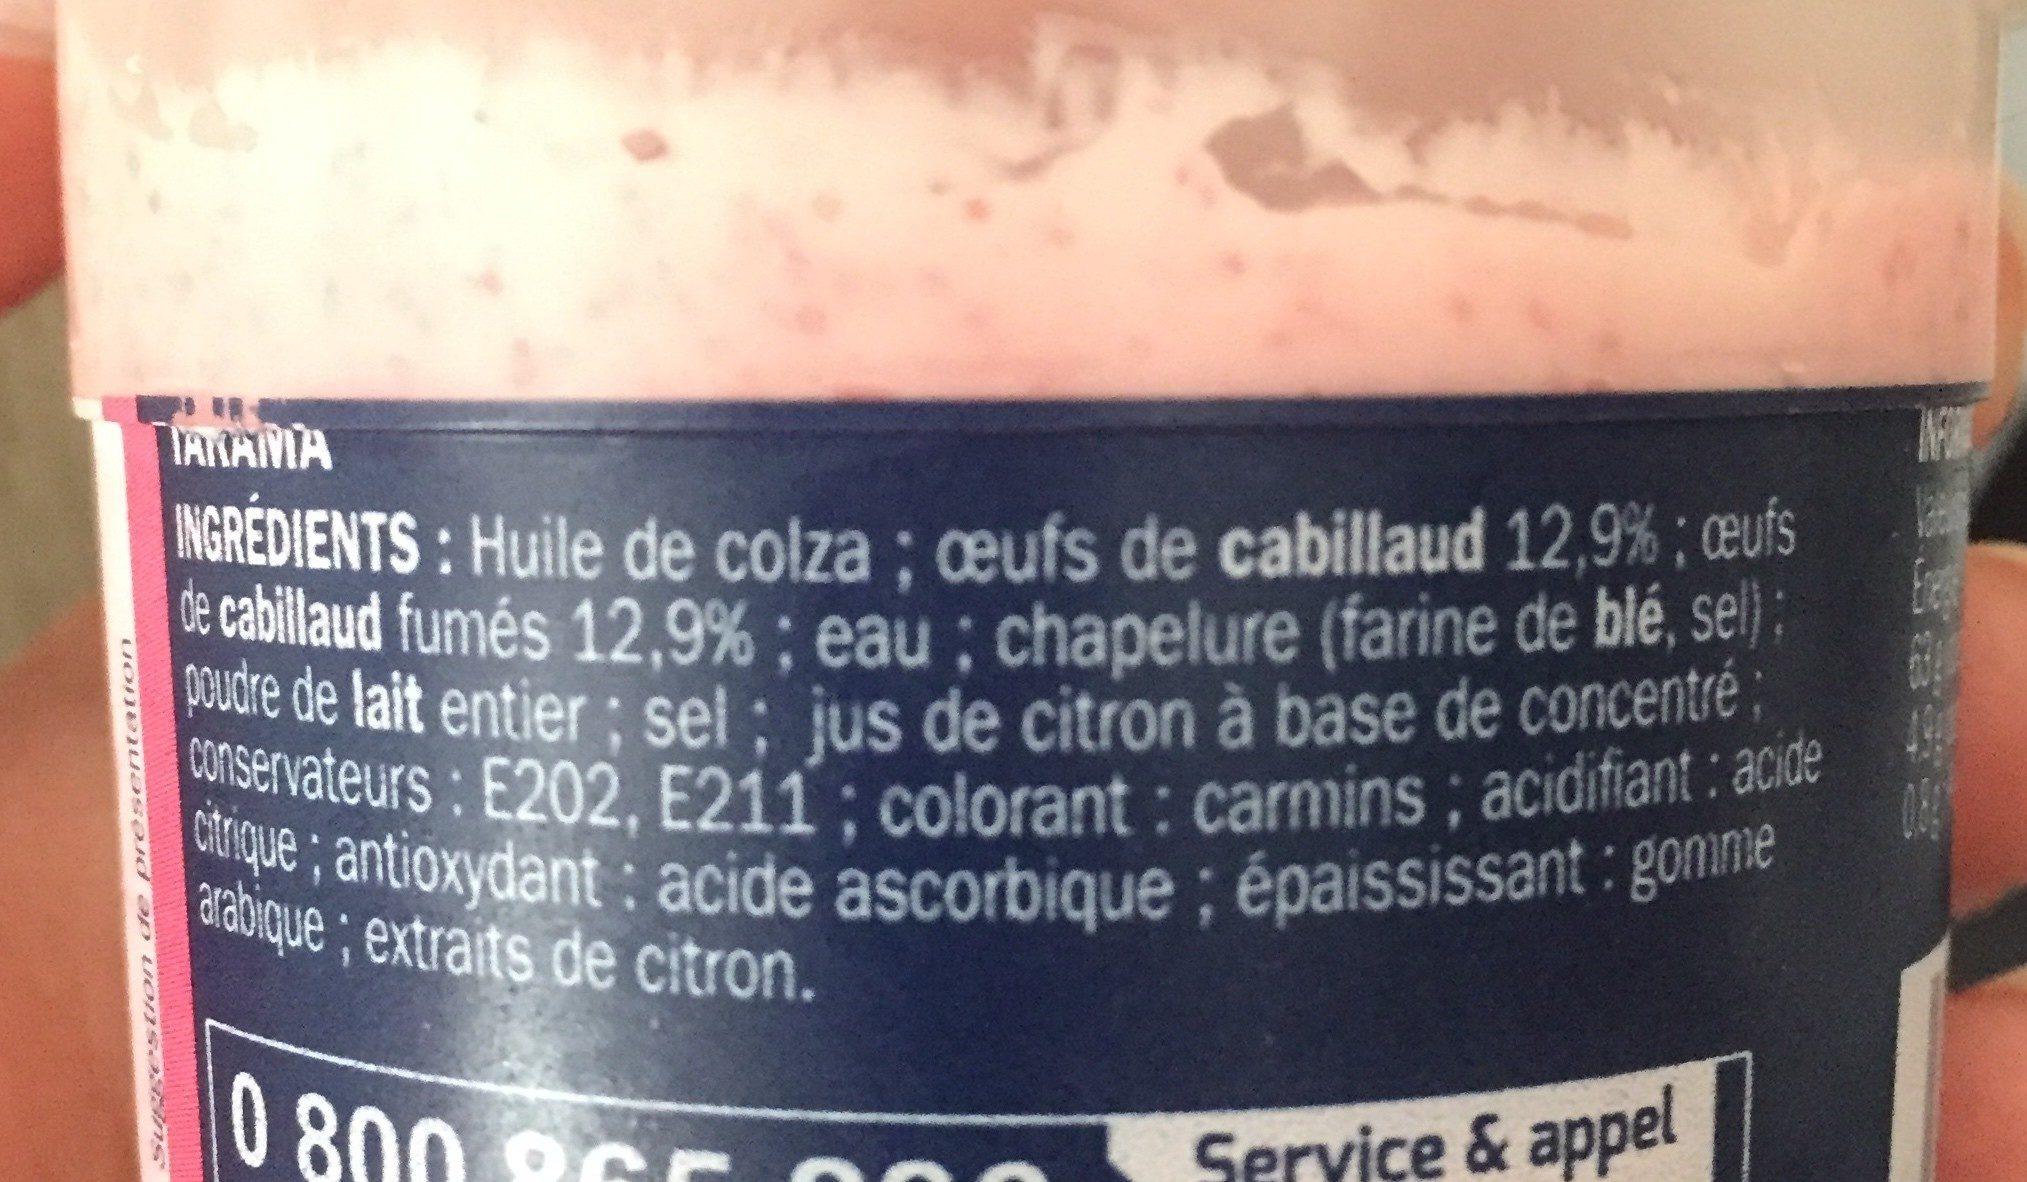 Tarama aux oeufs de cabillaud - Ingredients - en